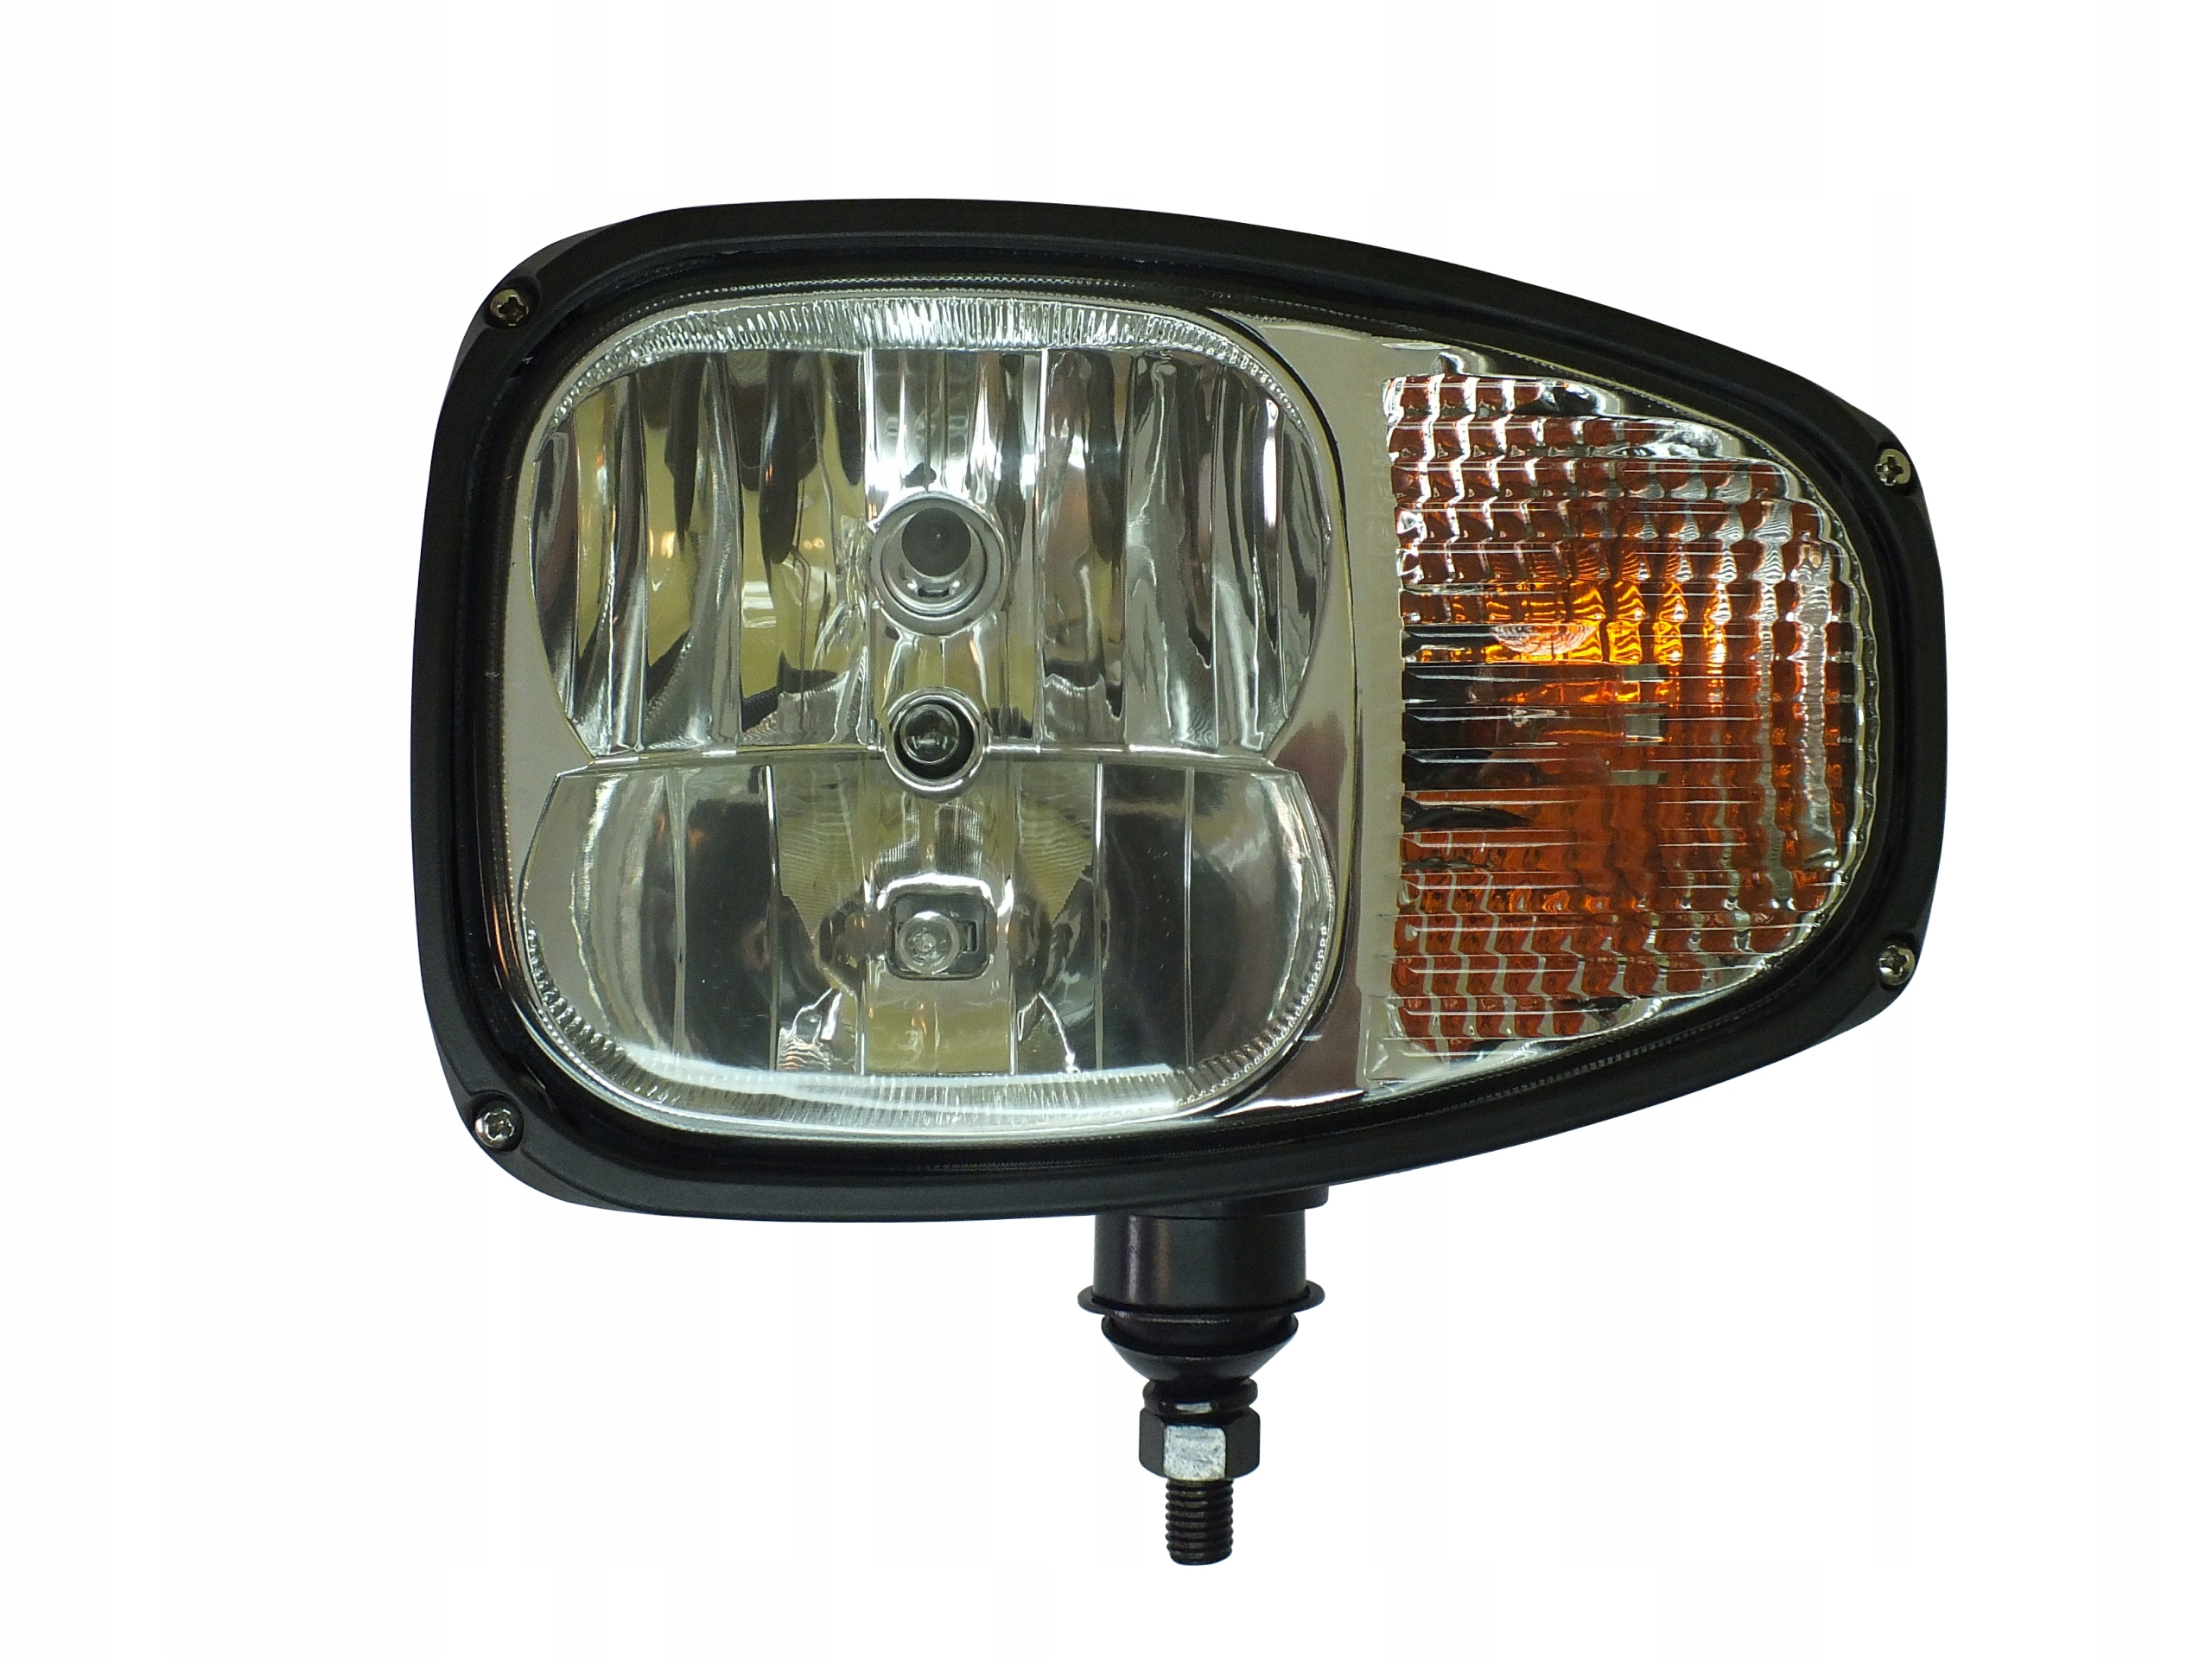 Lampa przednia lewa JCB,Cat,Manitou,Volvo,Terex